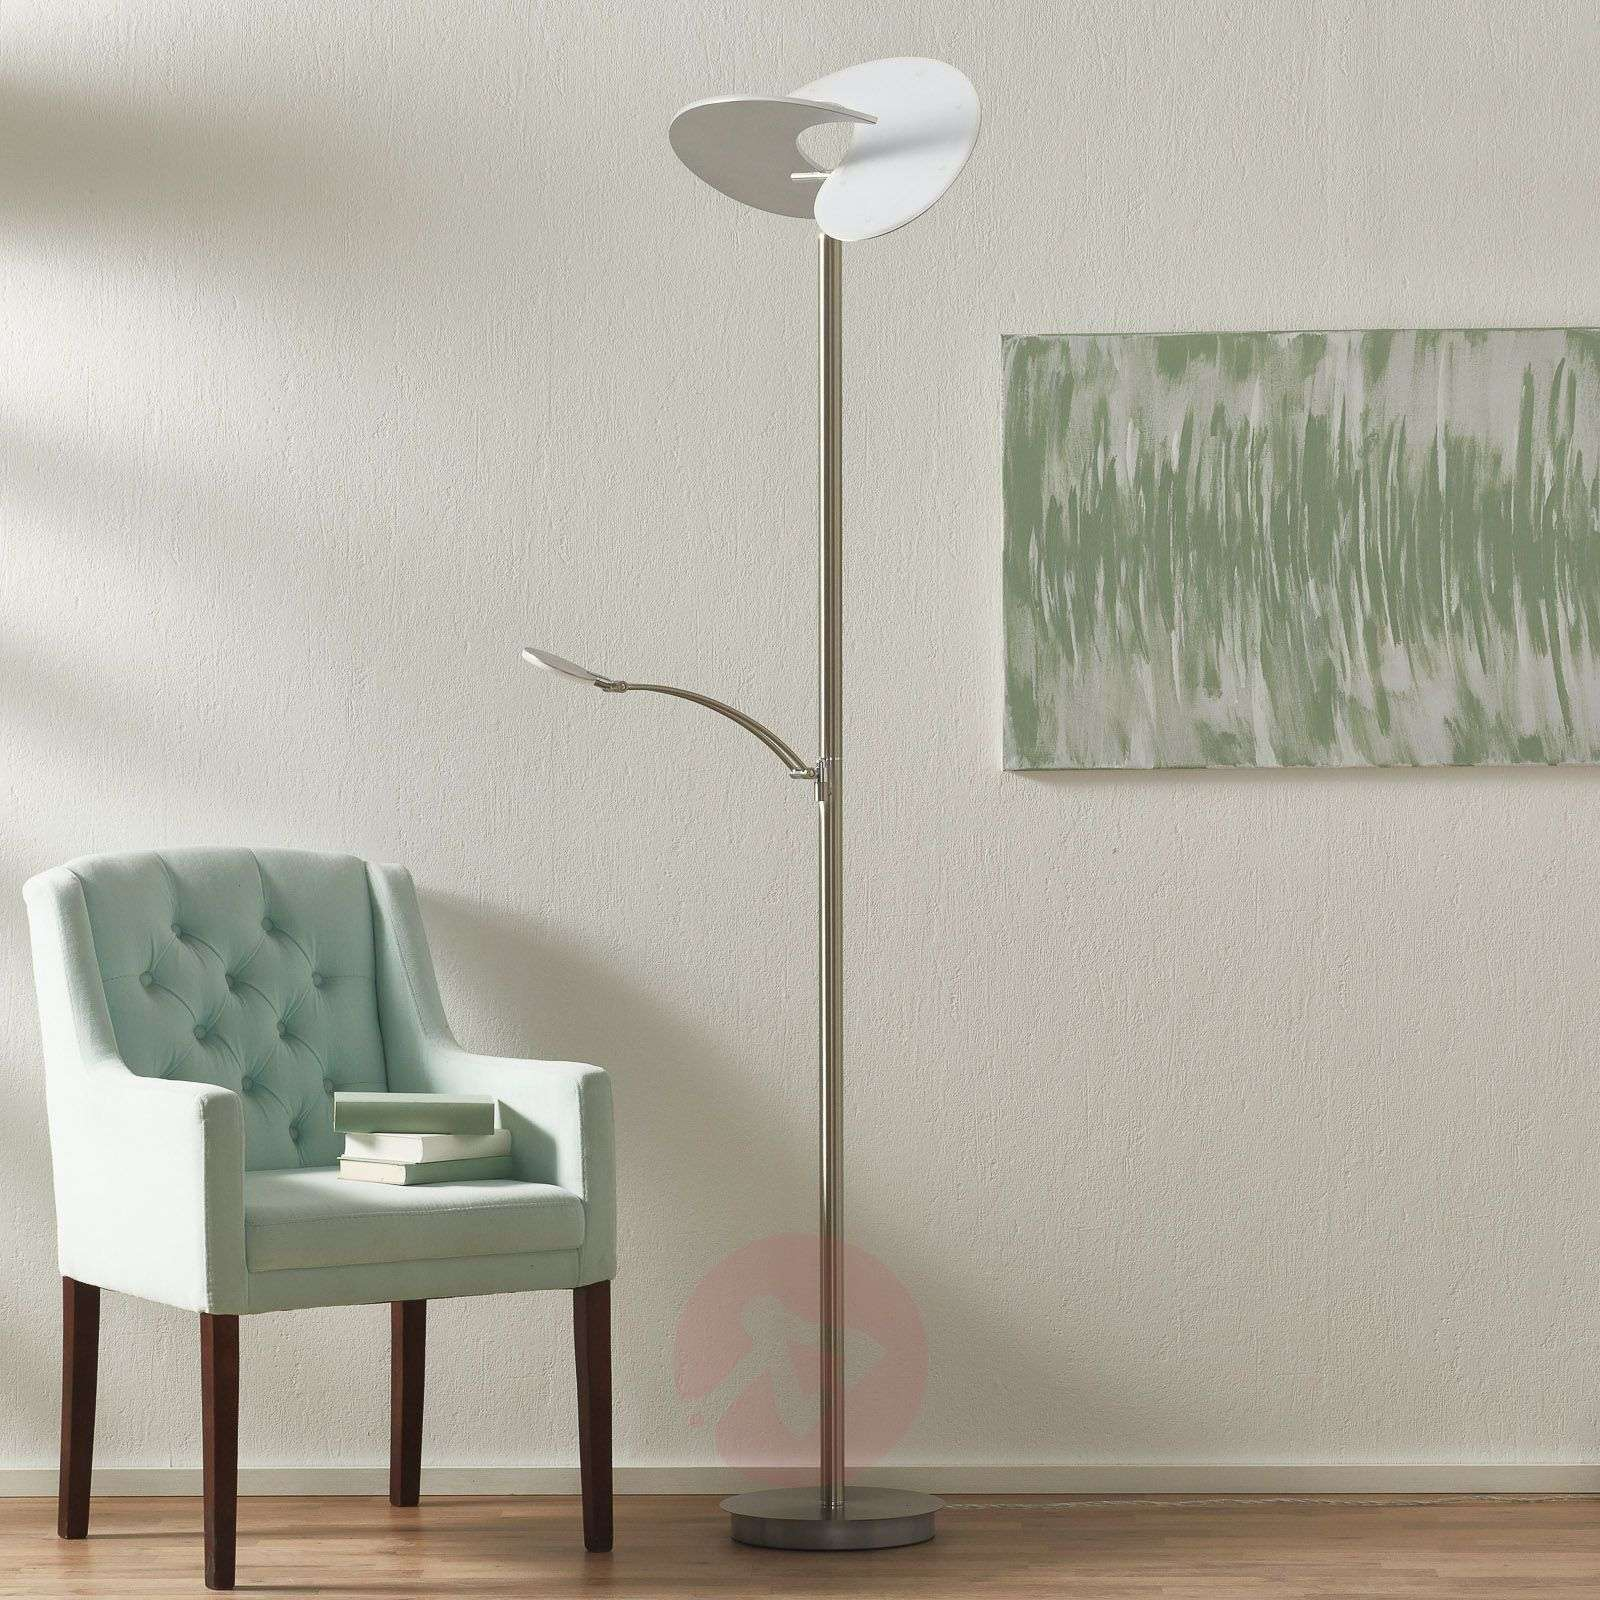 LED-lattiavalaisin Malibu muistitoiminnolla-1554002-01